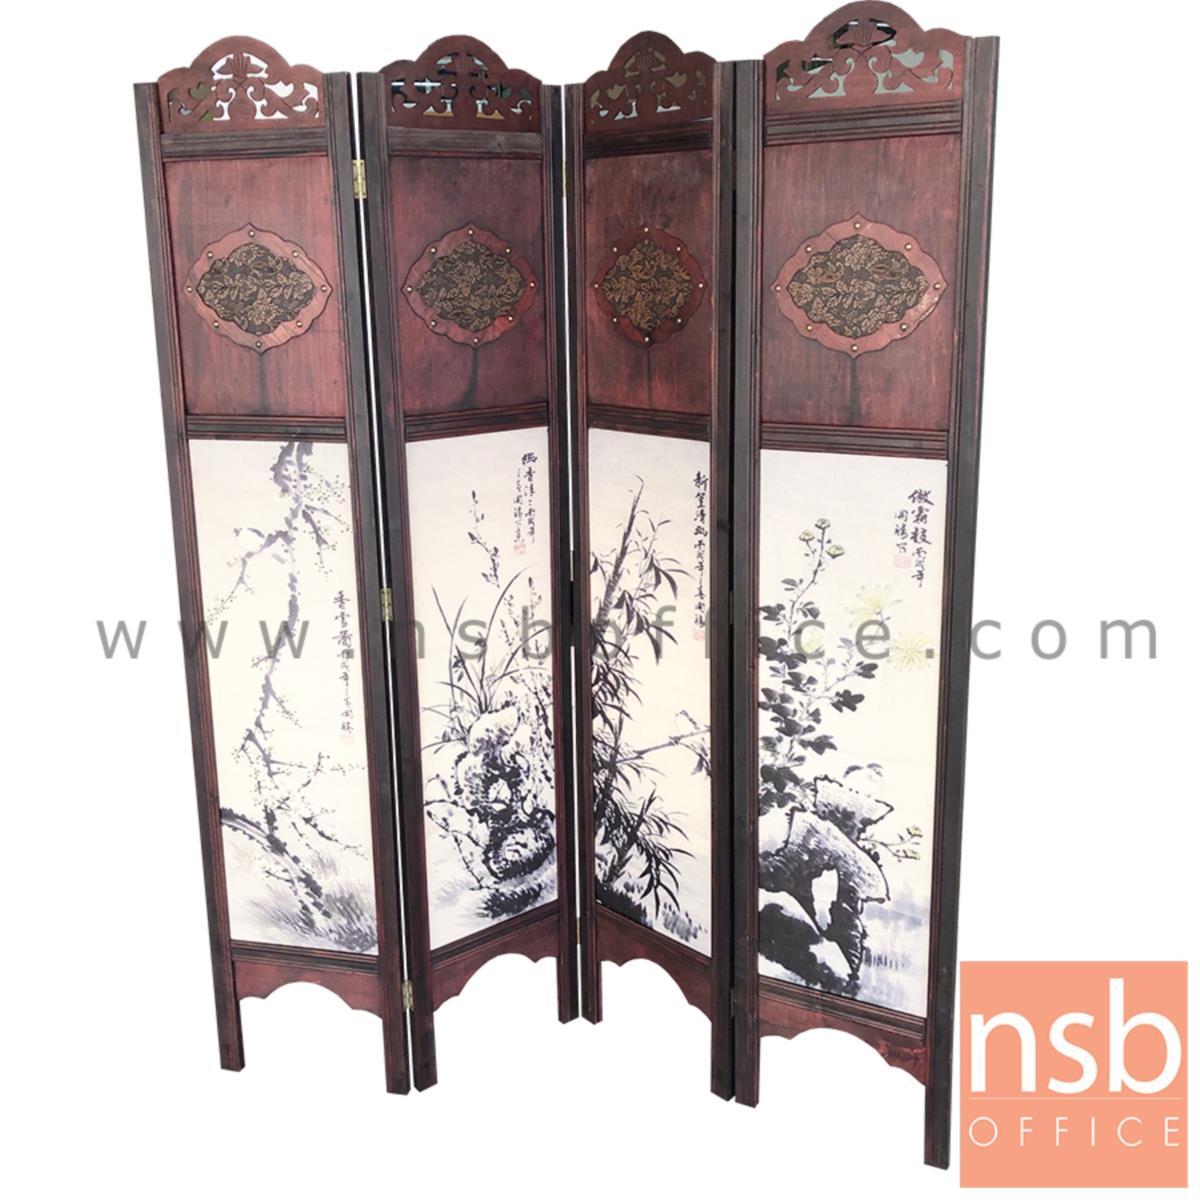 G11A046:ฉากกั้นห้อง 4 บานพับไม้จริงลายภาพพู่กันจีน 140W*176H cm. รุ่น